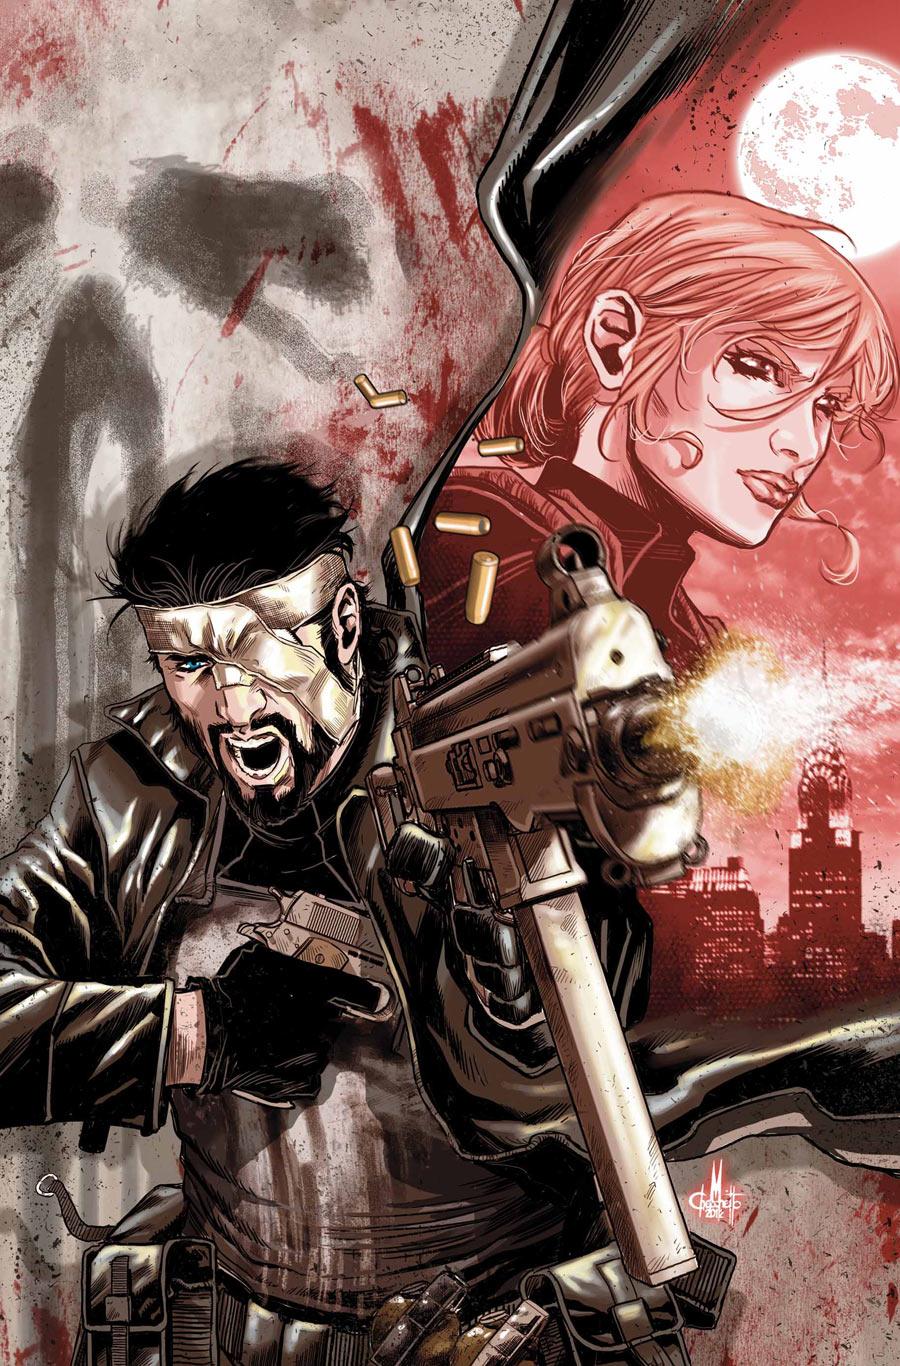 http://www.gregrucka.com/wp/wp-content/uploads/2011/09/Punisher-13.jpg